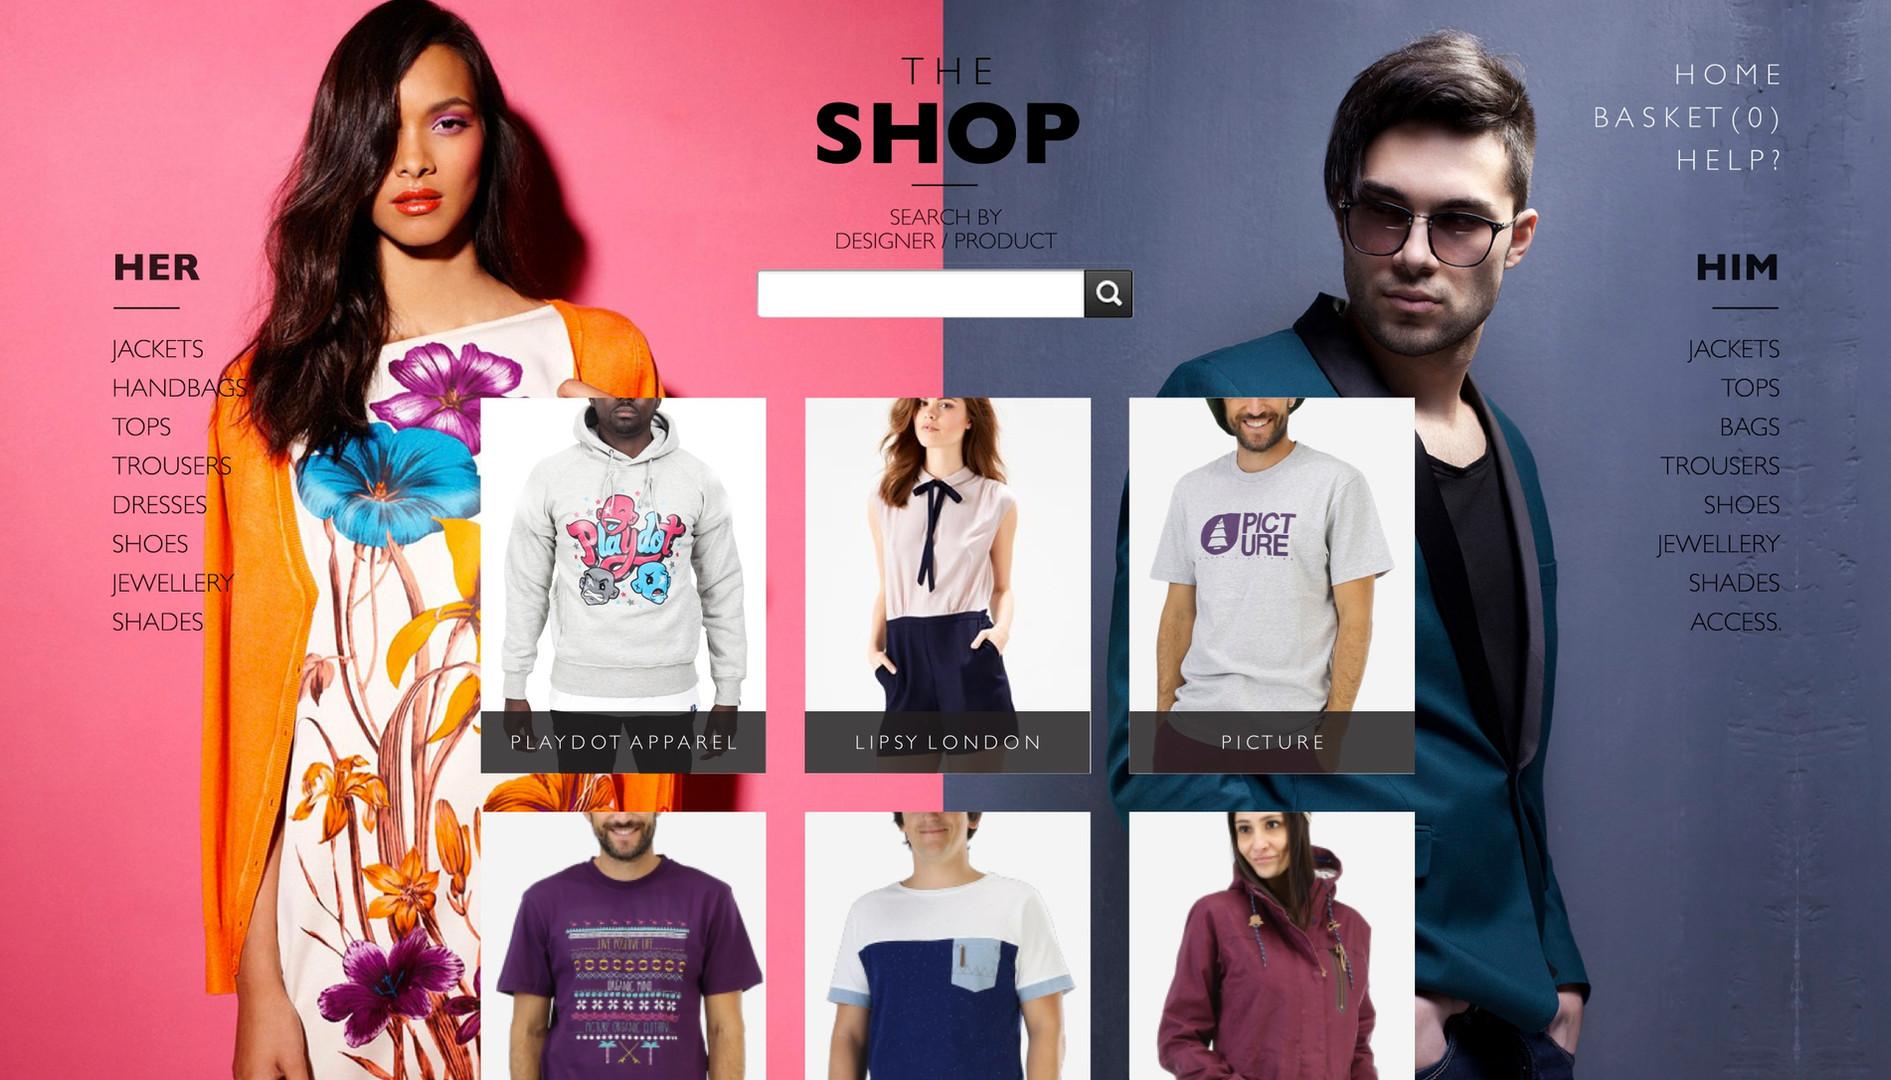 Web design by Lorenzo Barbieri